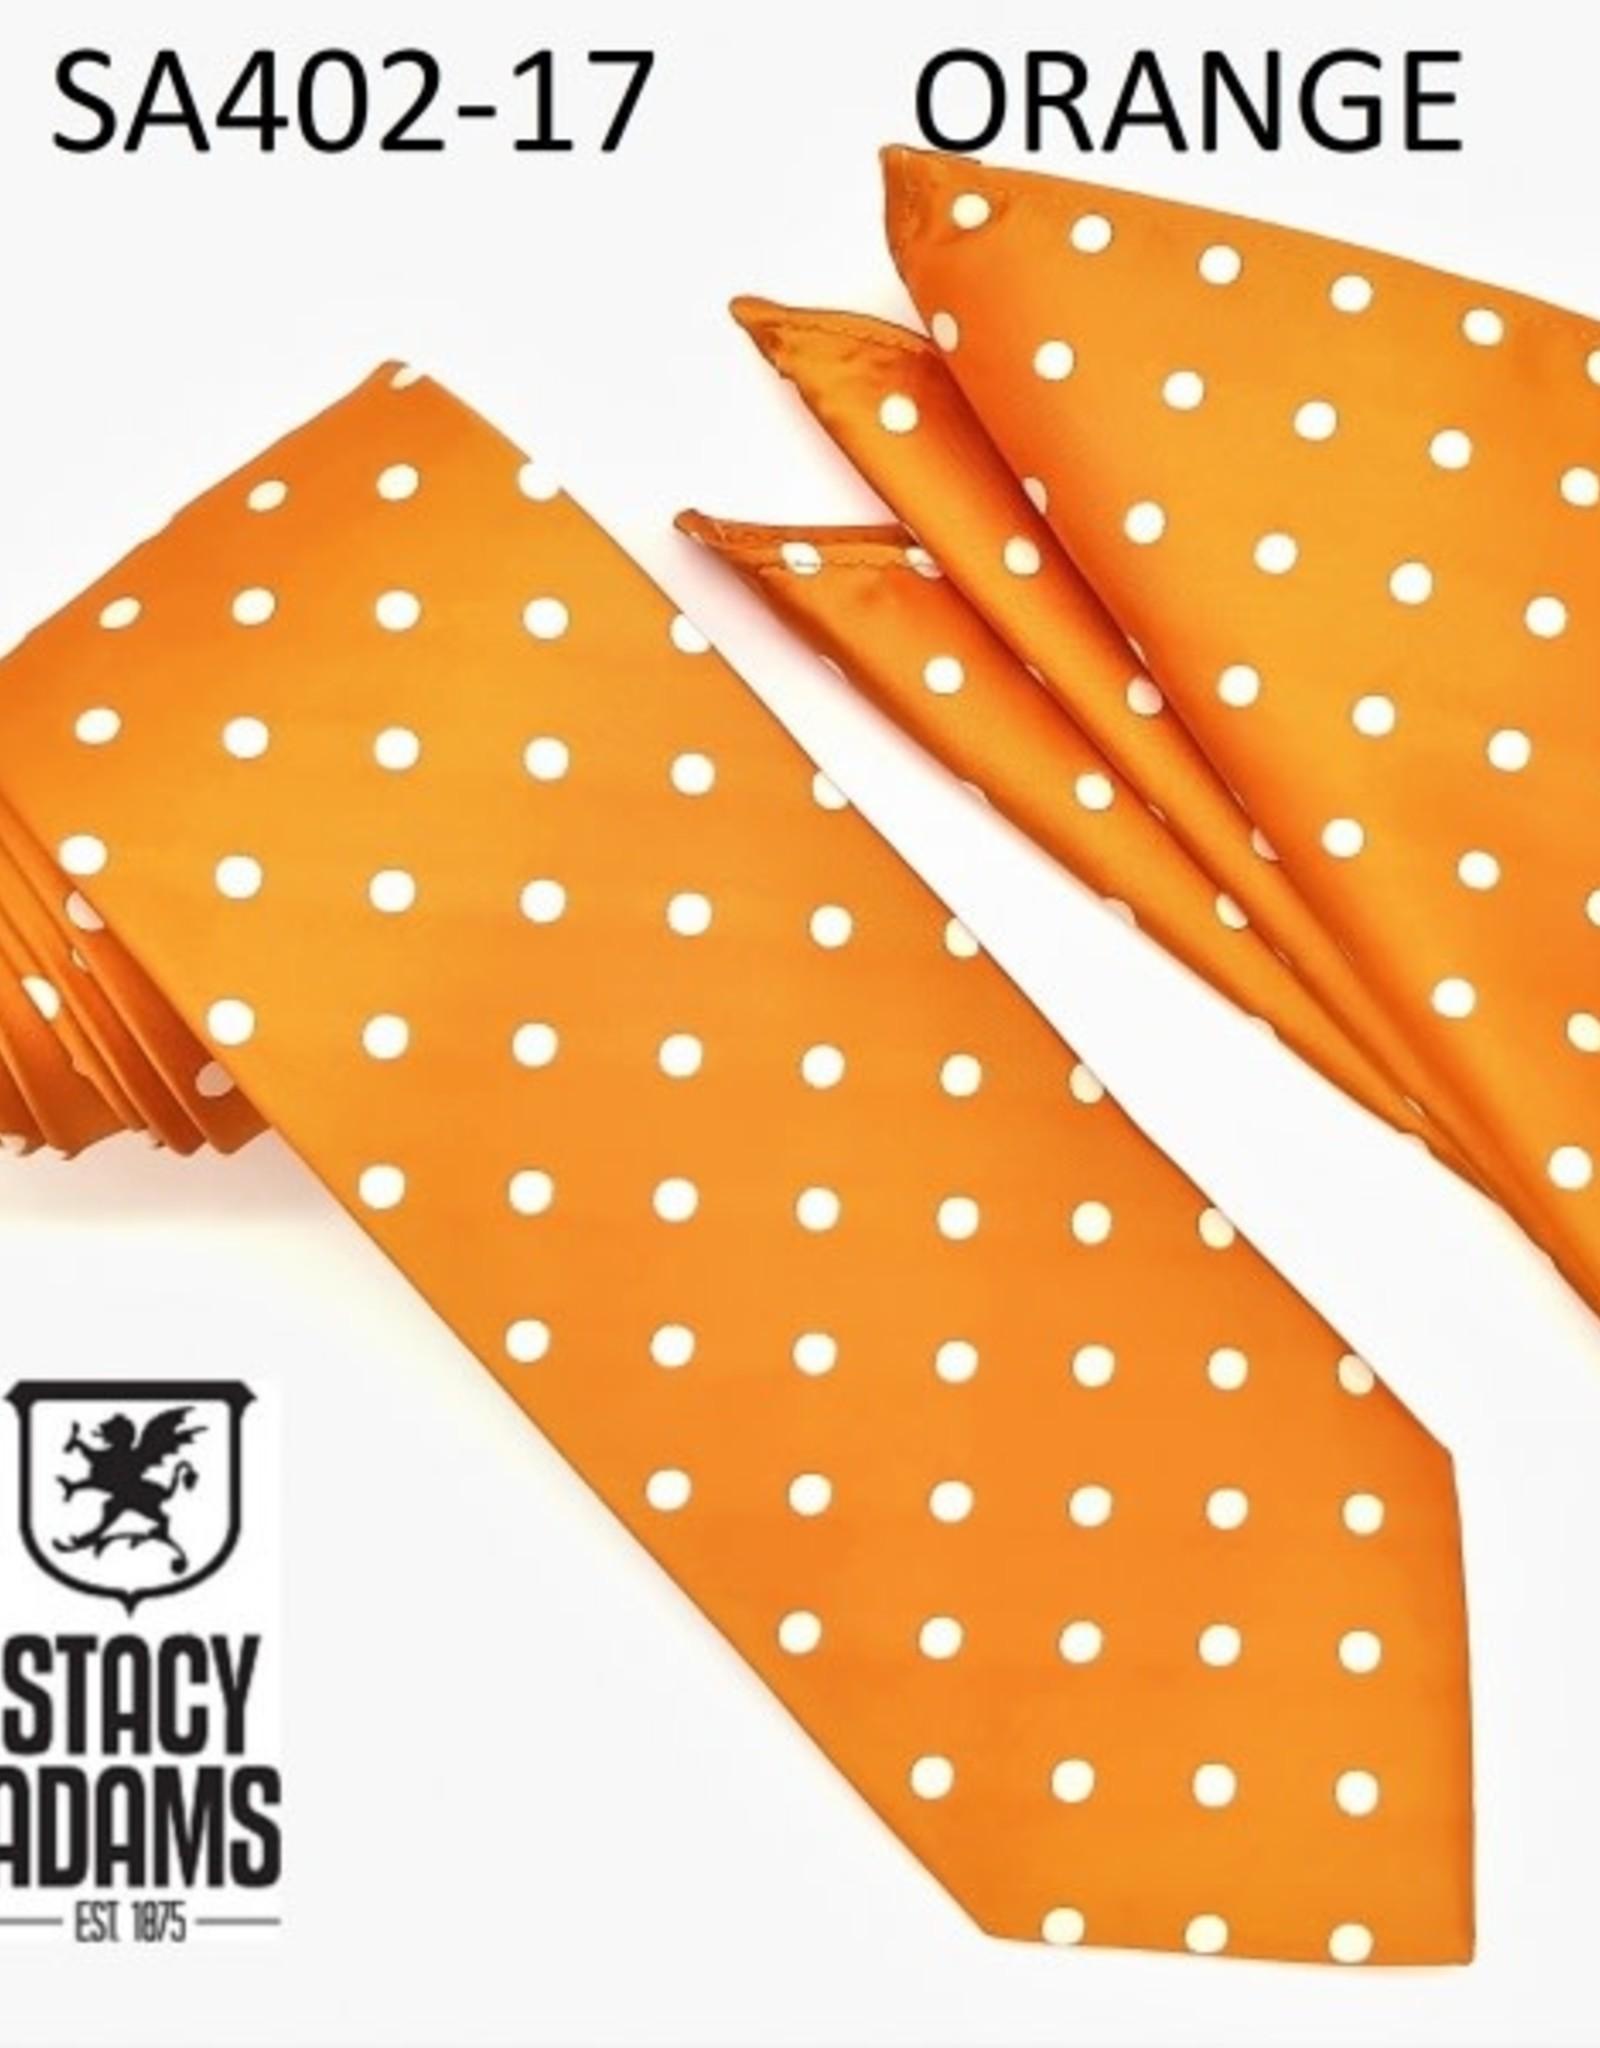 Stacy Adams Tie Stacy Adams Reg PolkaDot sa402-17 Orange